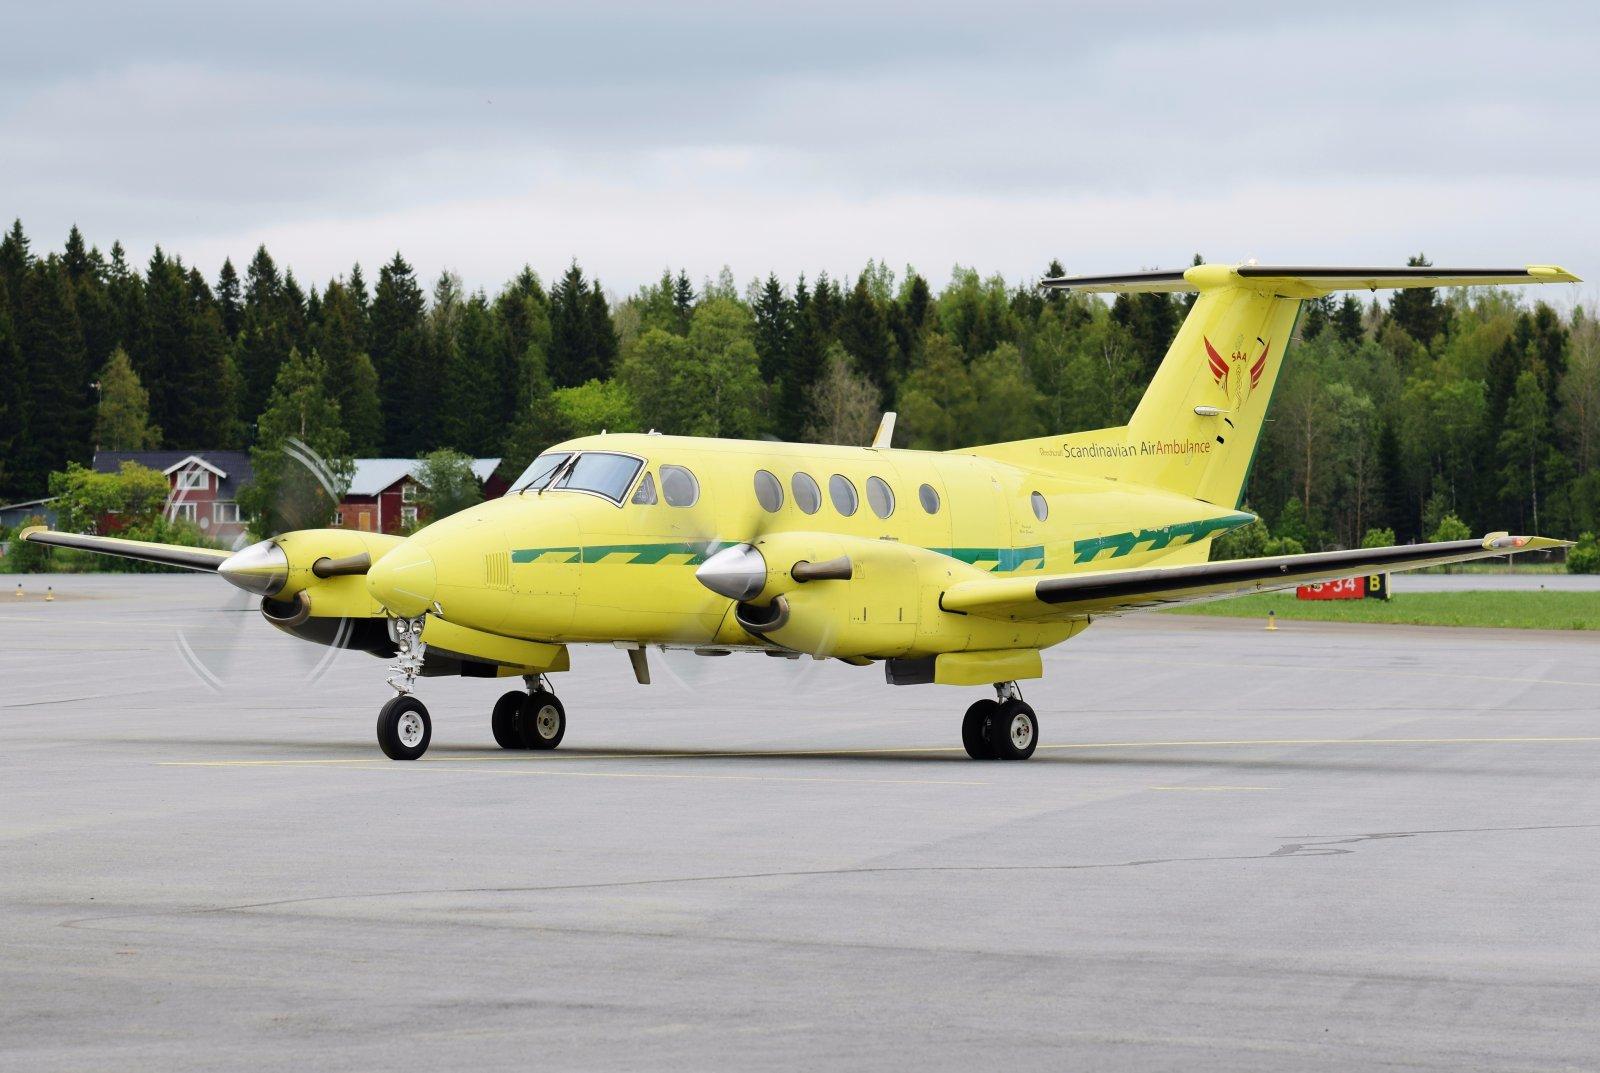 SE-KFP - Beechcraft B200C Super King Air - Scandinavian Air Ambulance (SAA) - 24.5.2019